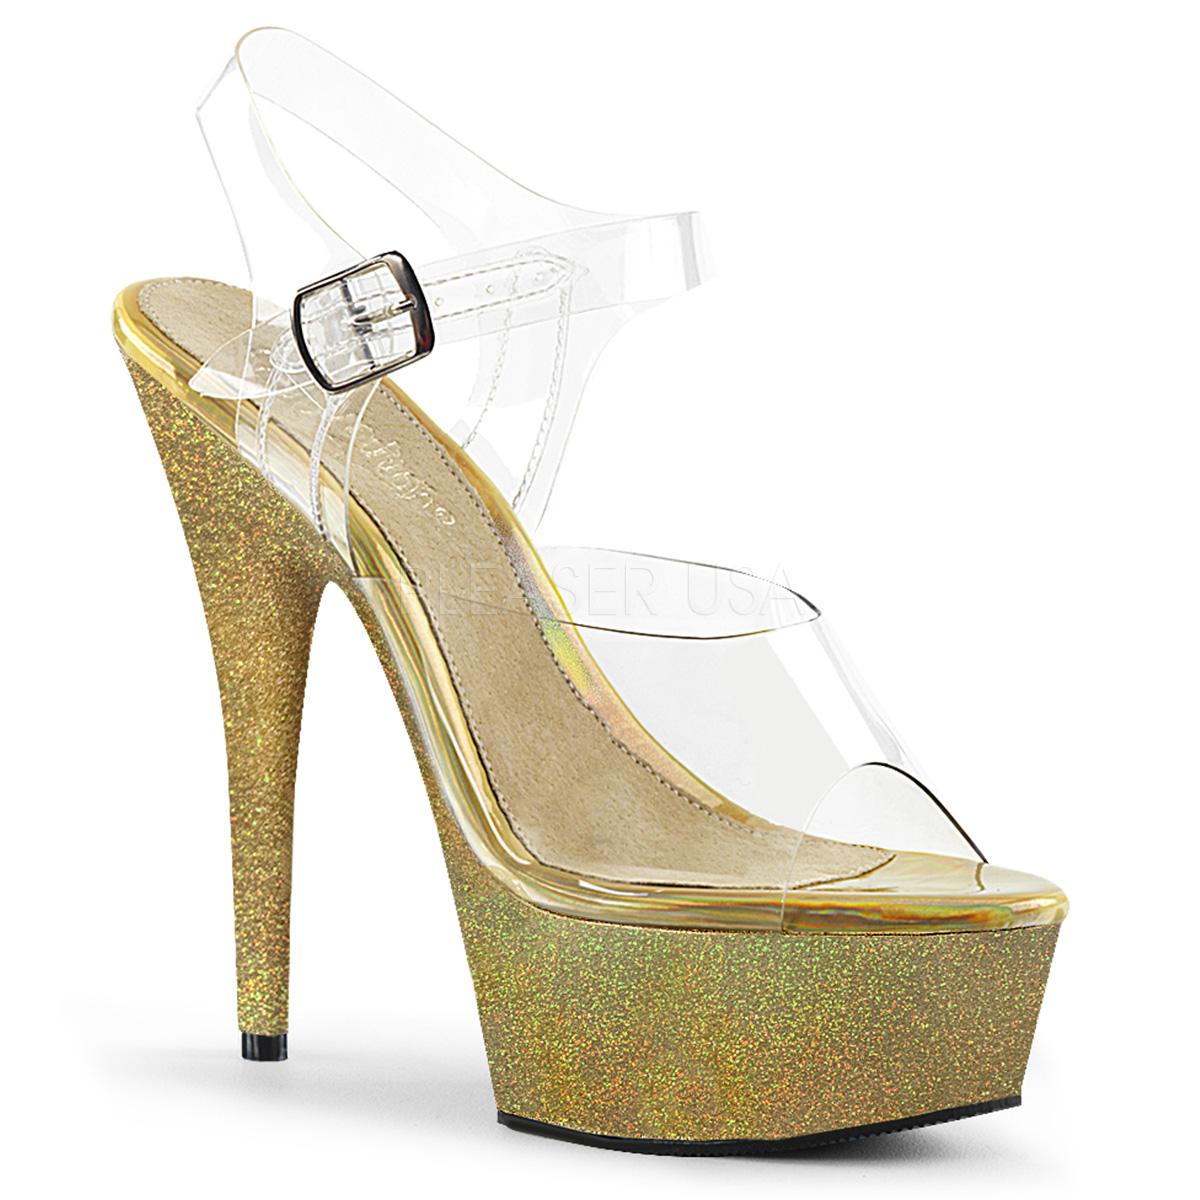 befba08697c Gold-glitter-15-cm-Pleaser-DELIGHT-608HG-Pole-dancing-high-heels-shoes -10569 0.jpg